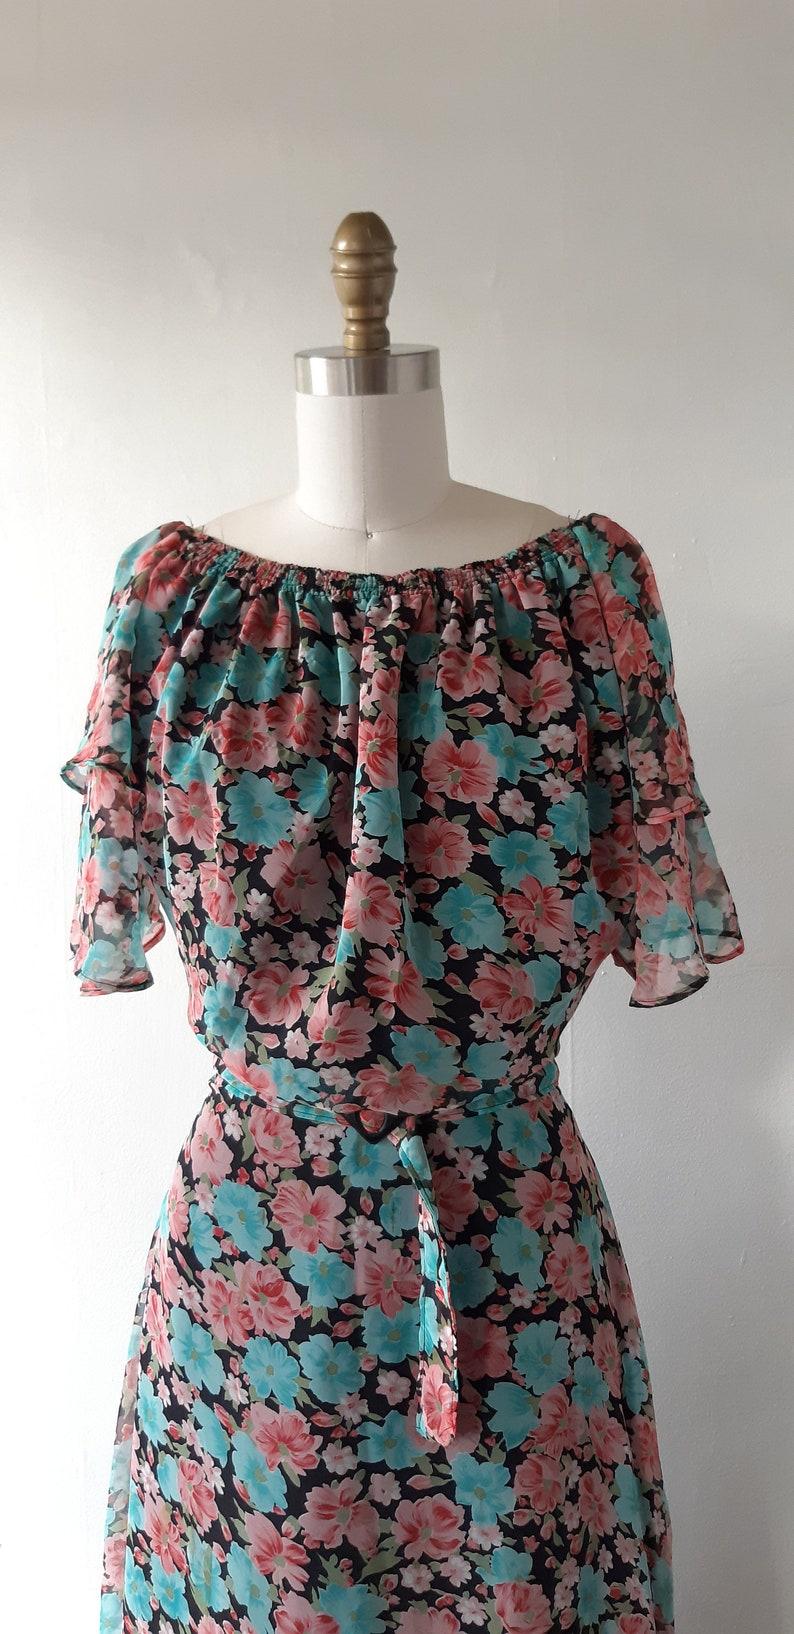 size medium vintage 1970s floral dress vintage 1970s floral print chiffon dress with flutter sleeves 70s does 30s floral dress